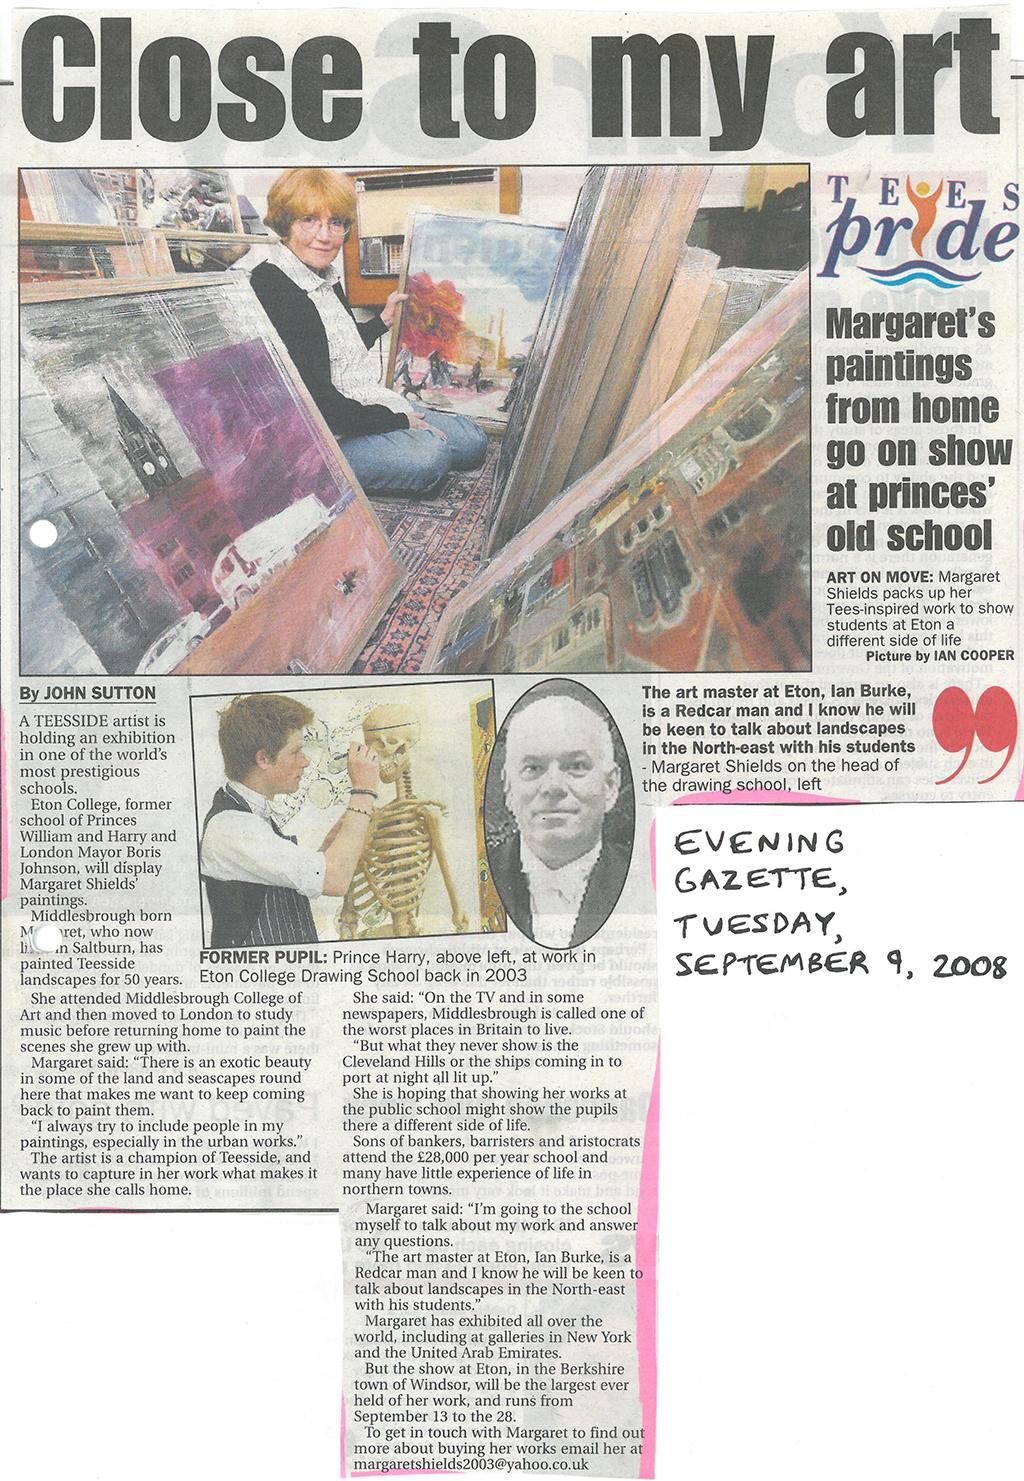 2008-09-09, Evening Gazette